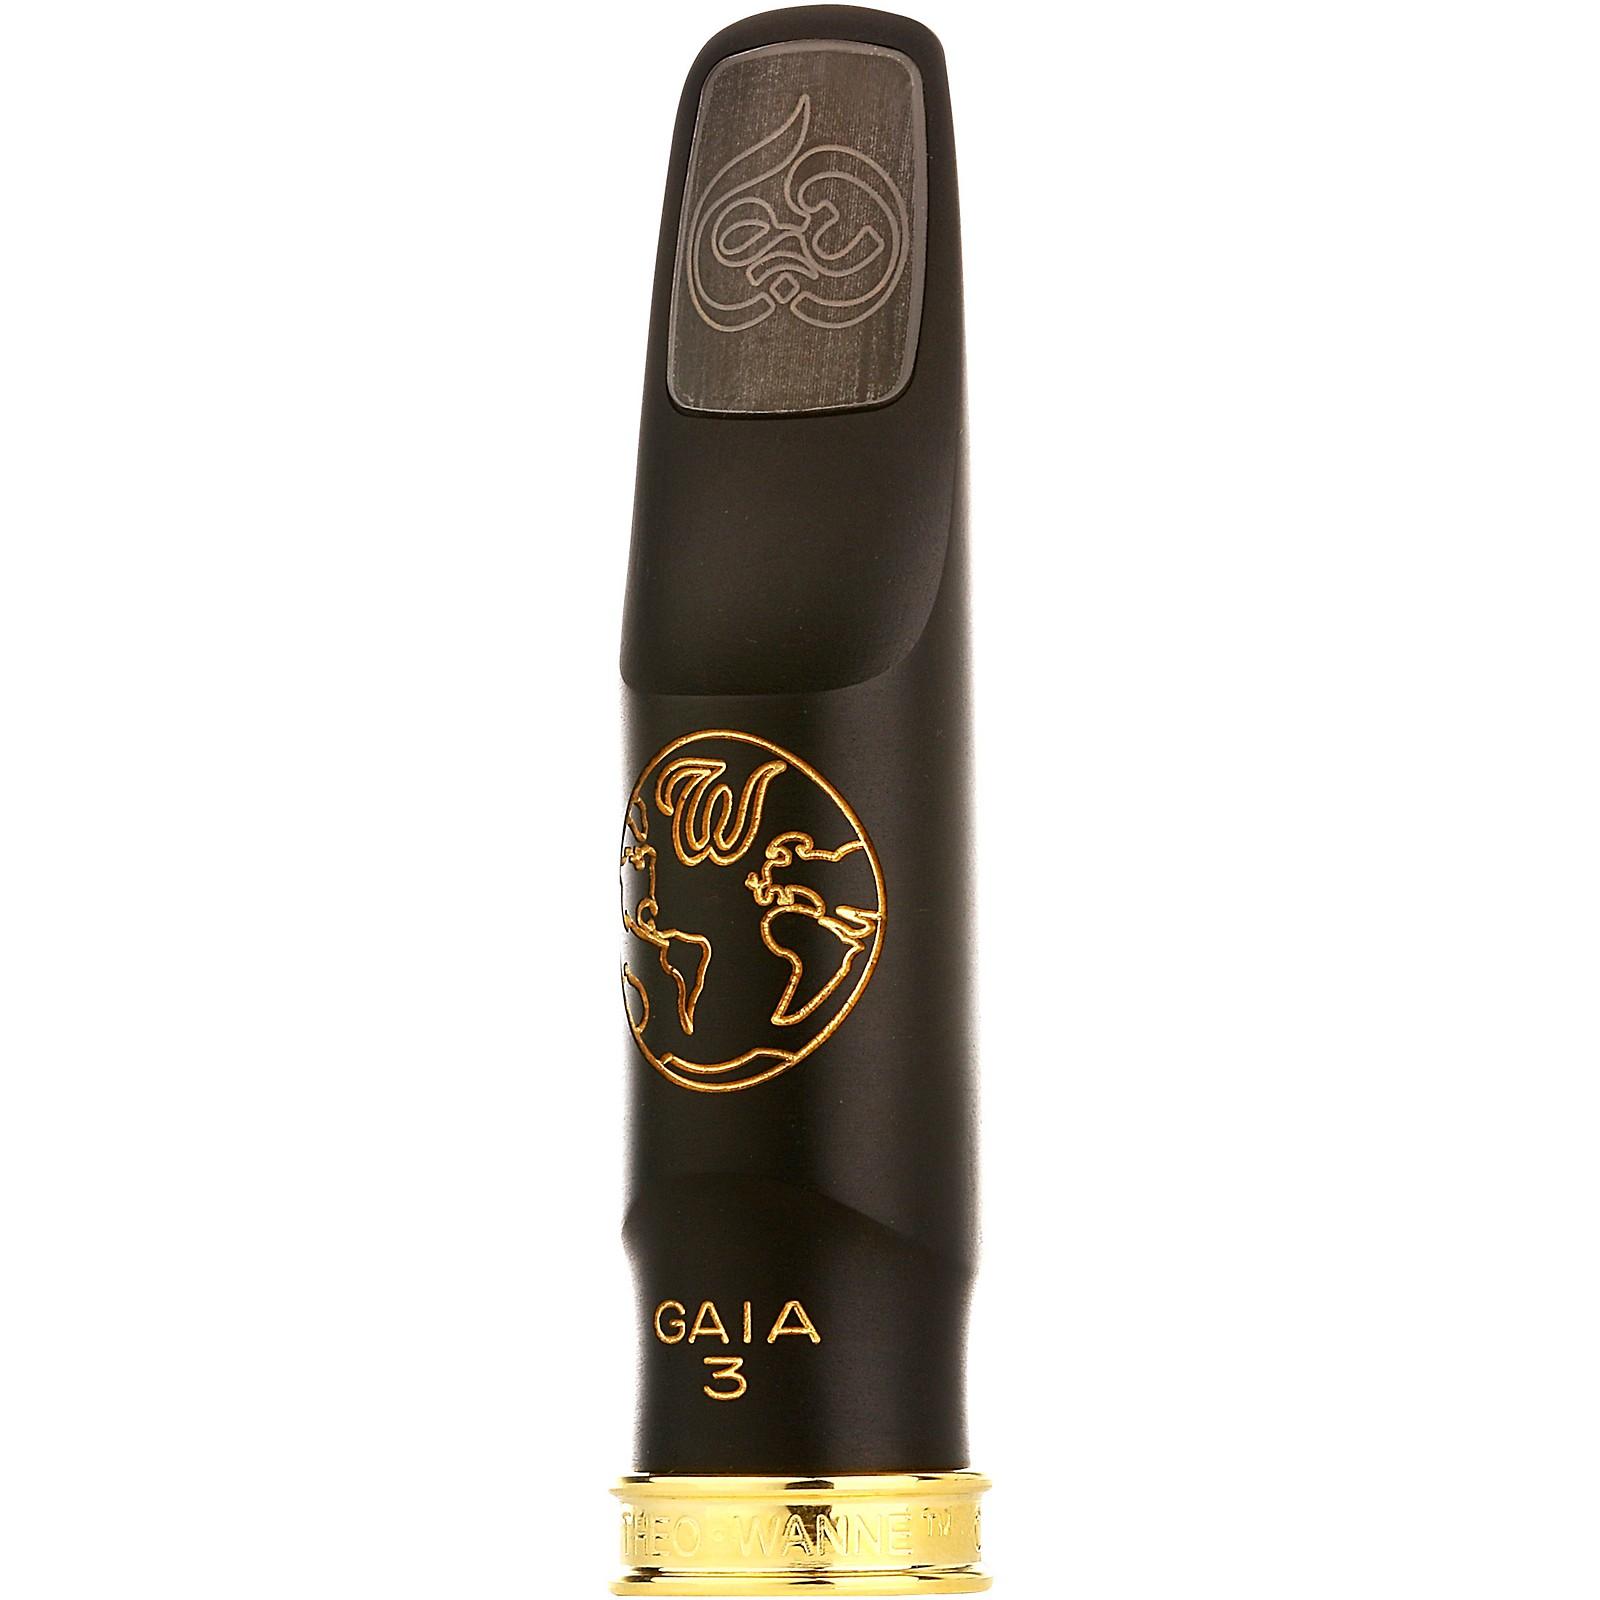 Open Box Theo Wanne GAIA 3 Hard Rubber Tenor Saxophone Mouthpiece